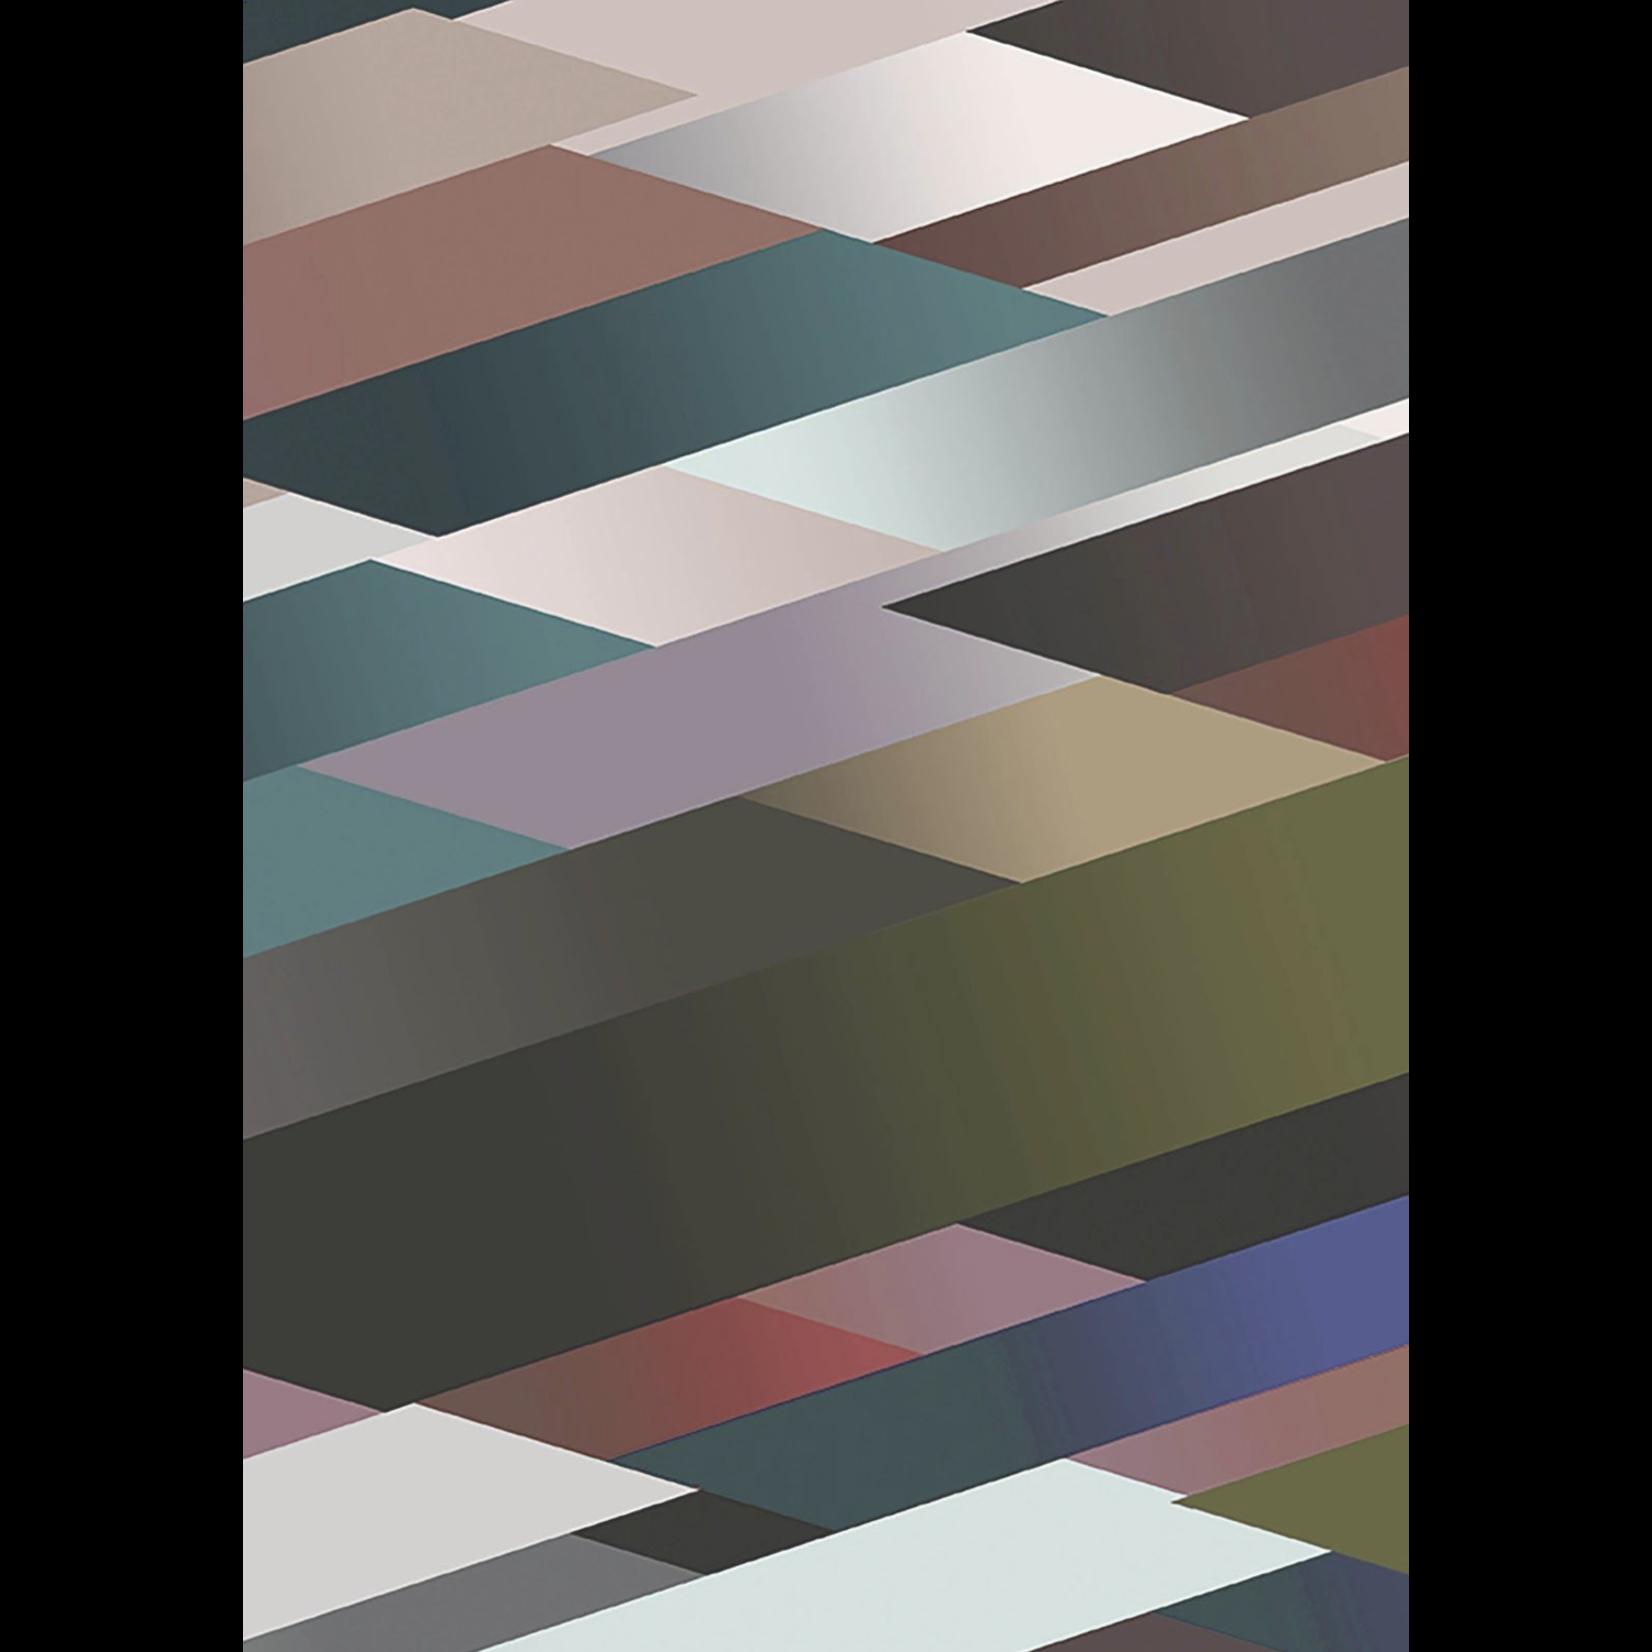 Kit Miles DG | Olive / Sapphire / Burgundy